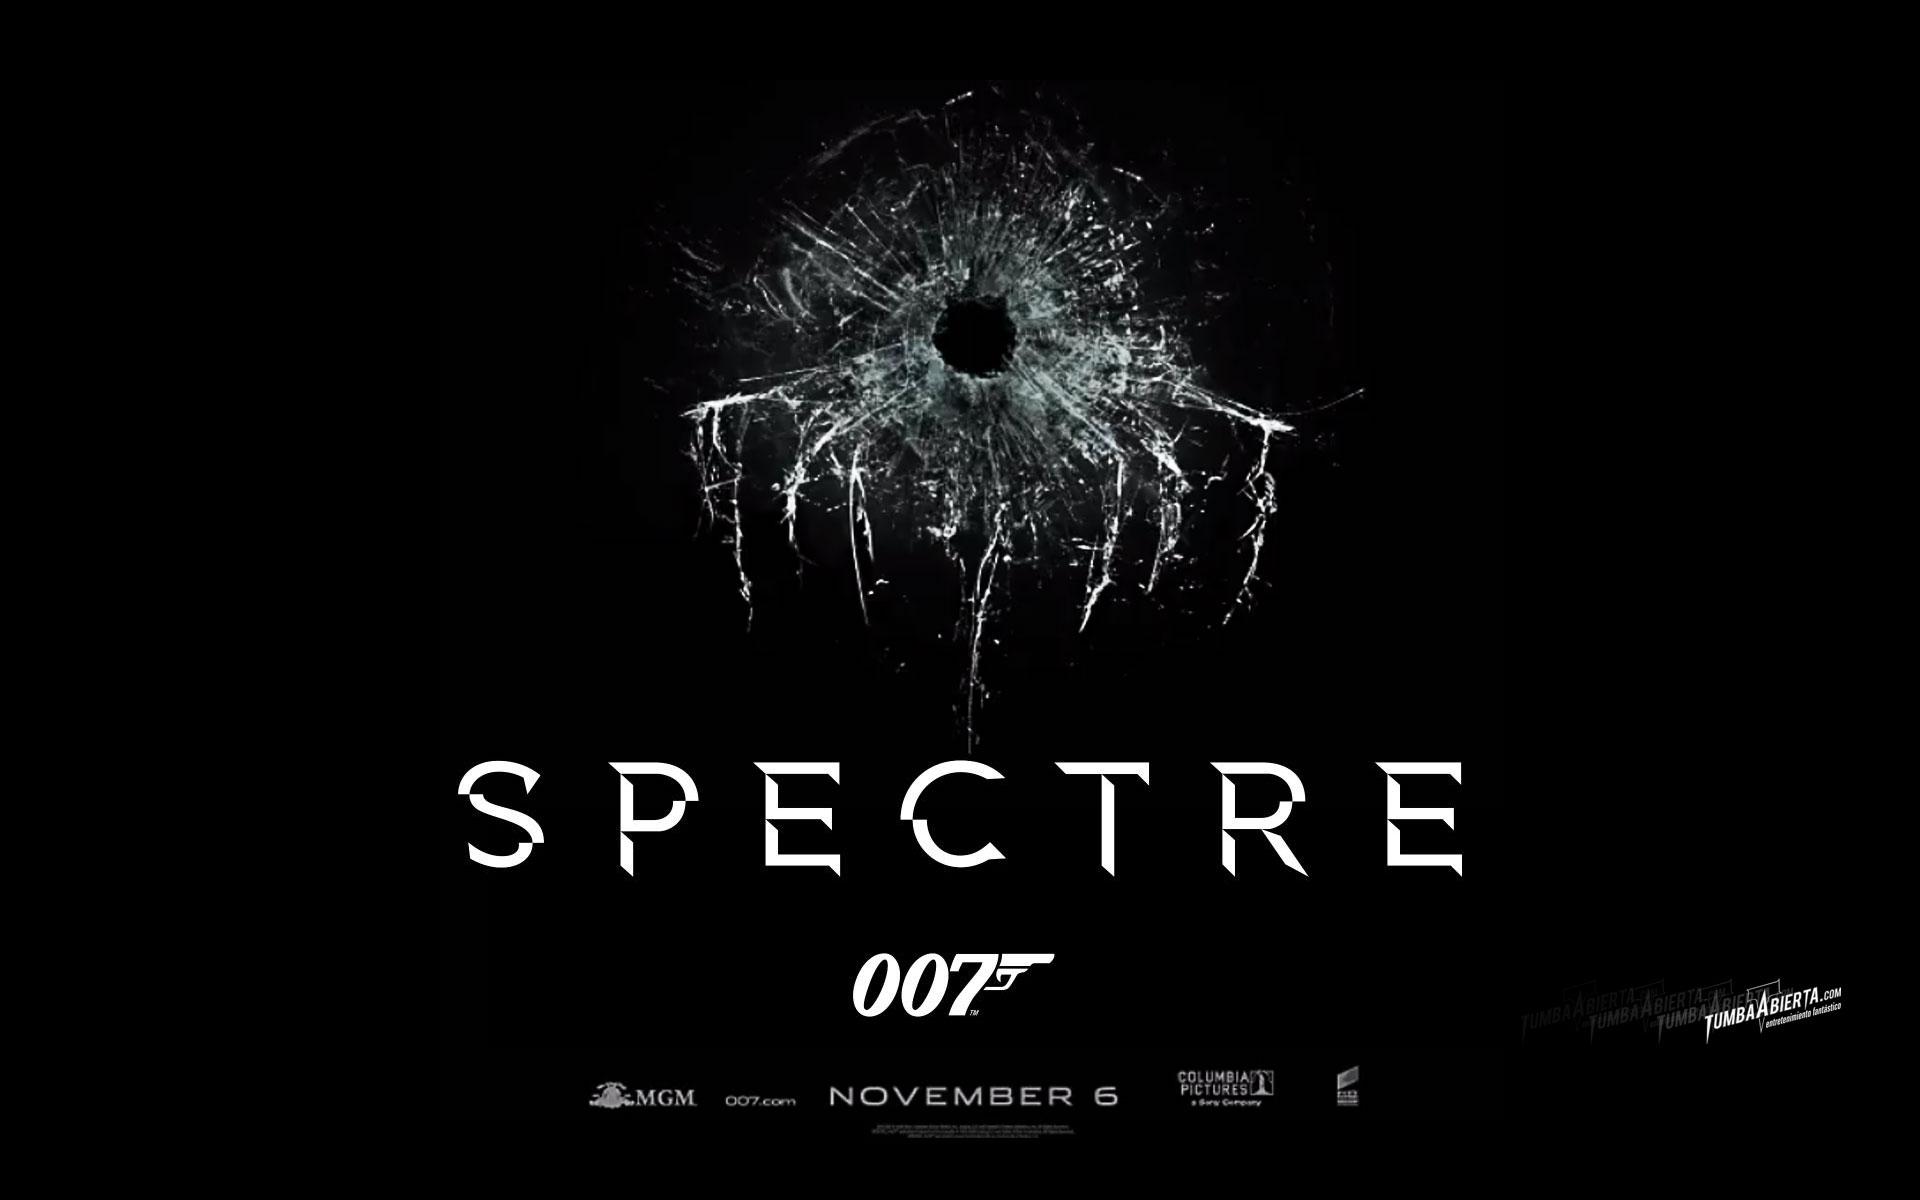 Spectre 007 Wallpaper on WallpaperSafari